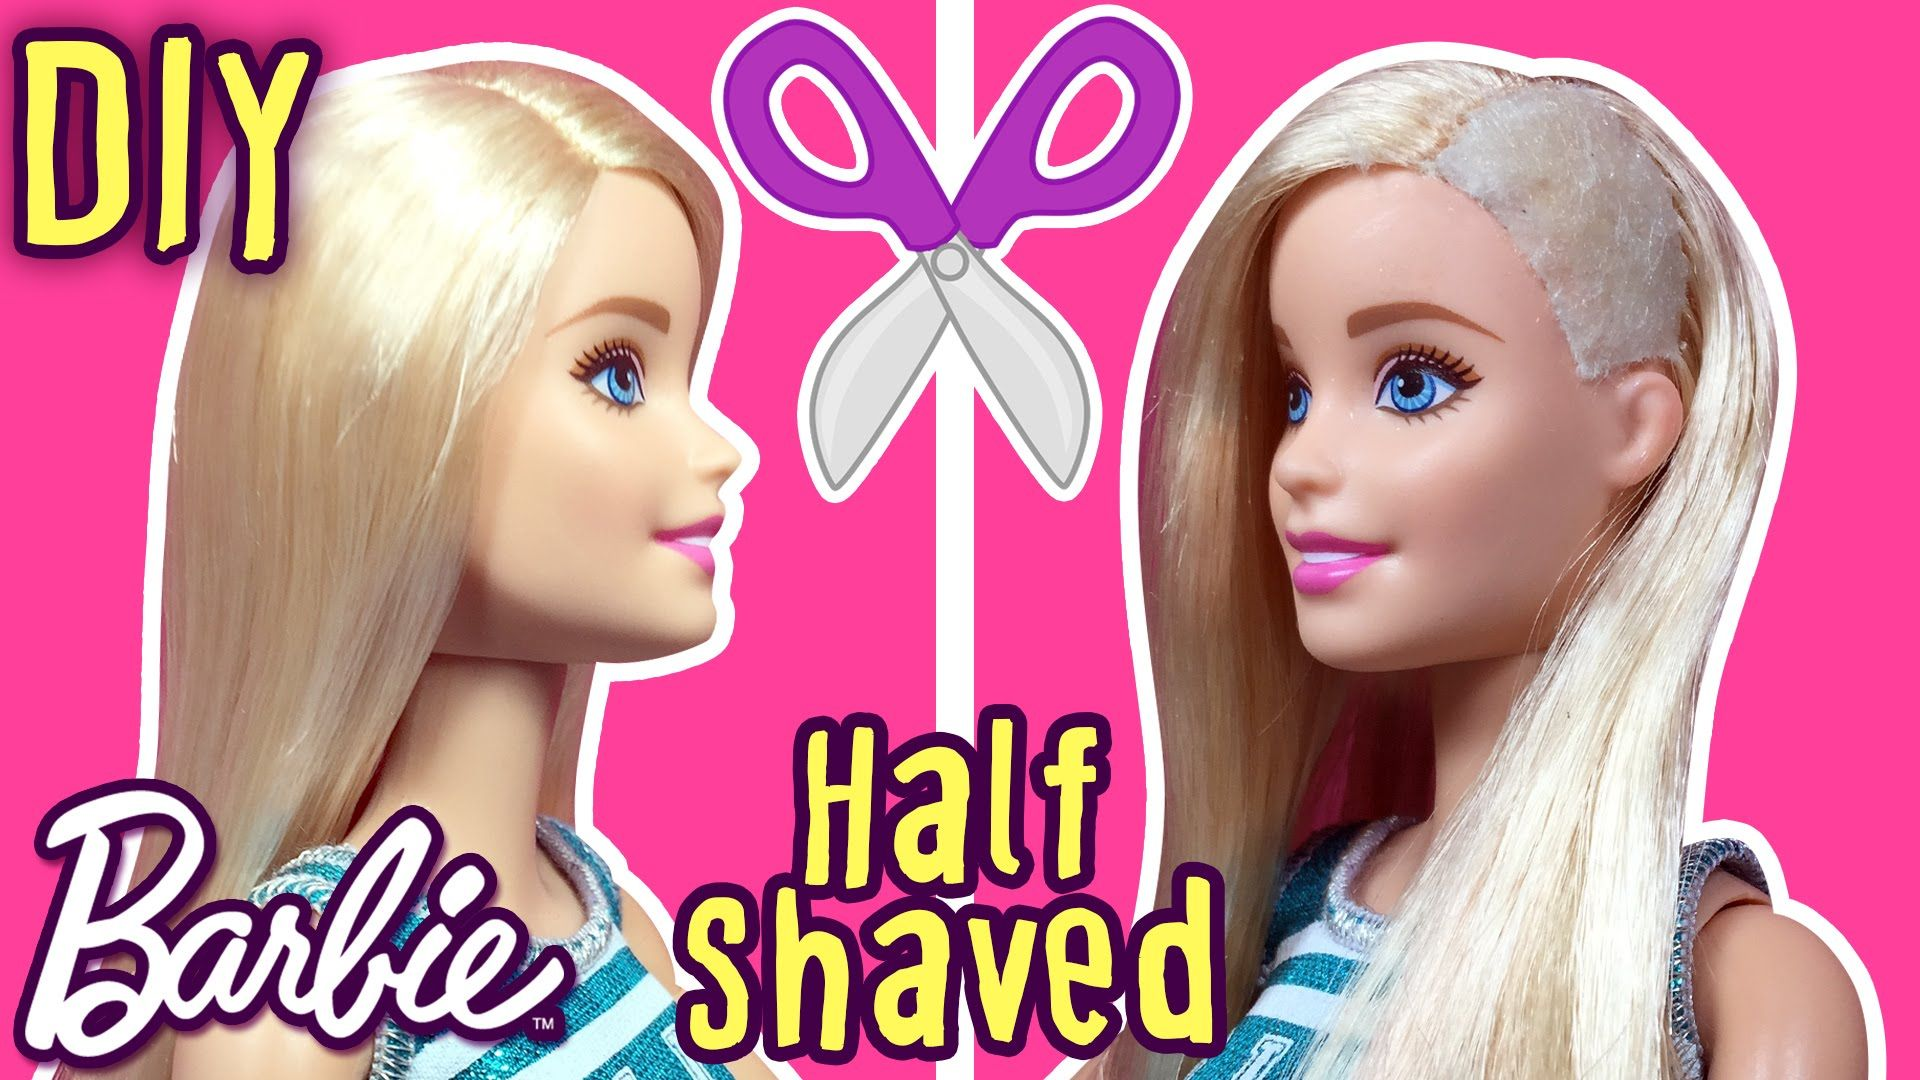 DIY How to Cut Half Shaved Hair Barbie Doll Sidecut Hair